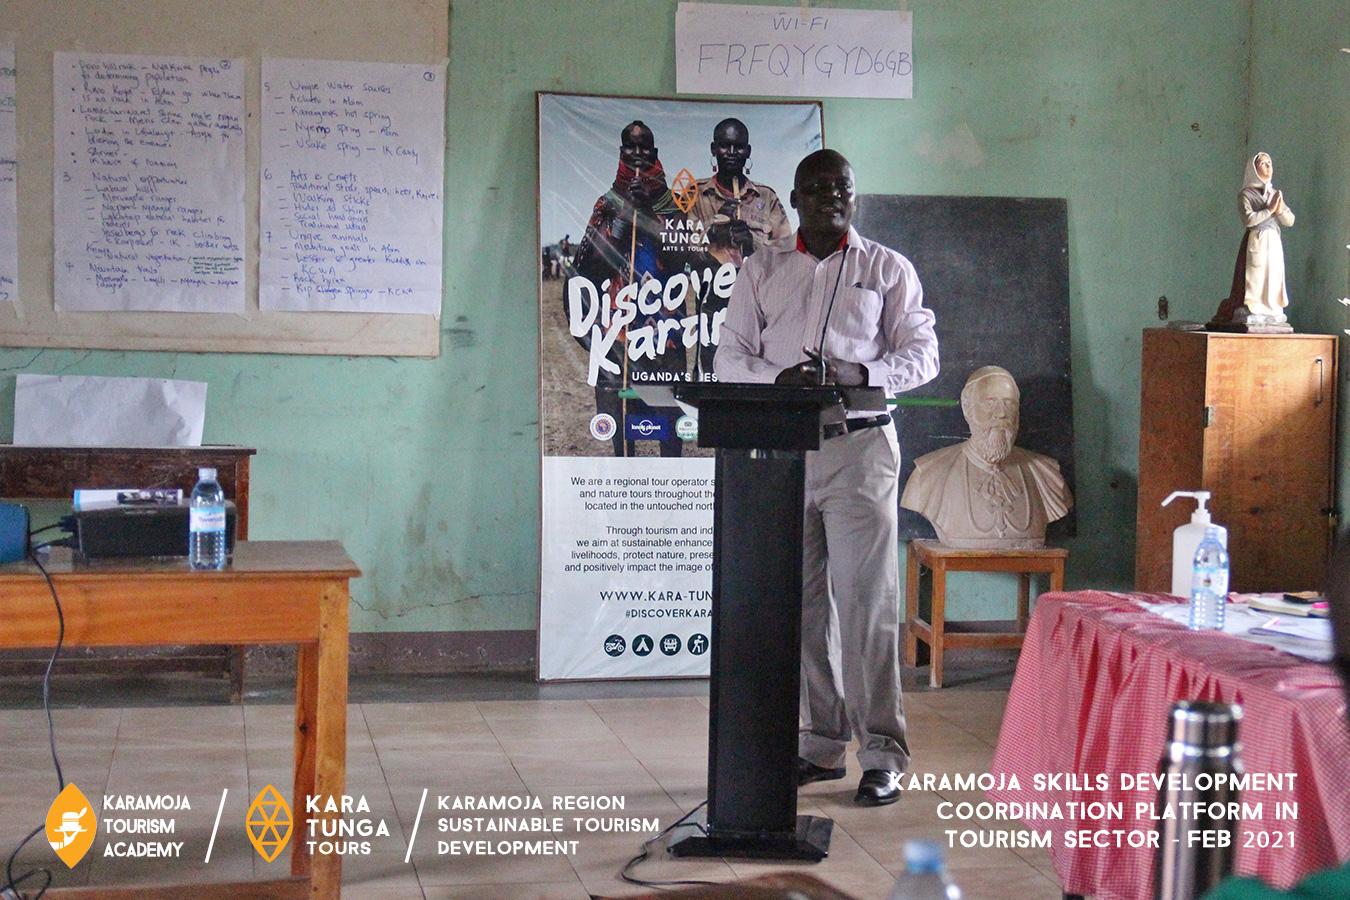 kara-tunga-karamoja-tourism-academy-stakeholder-meeting-2021-9